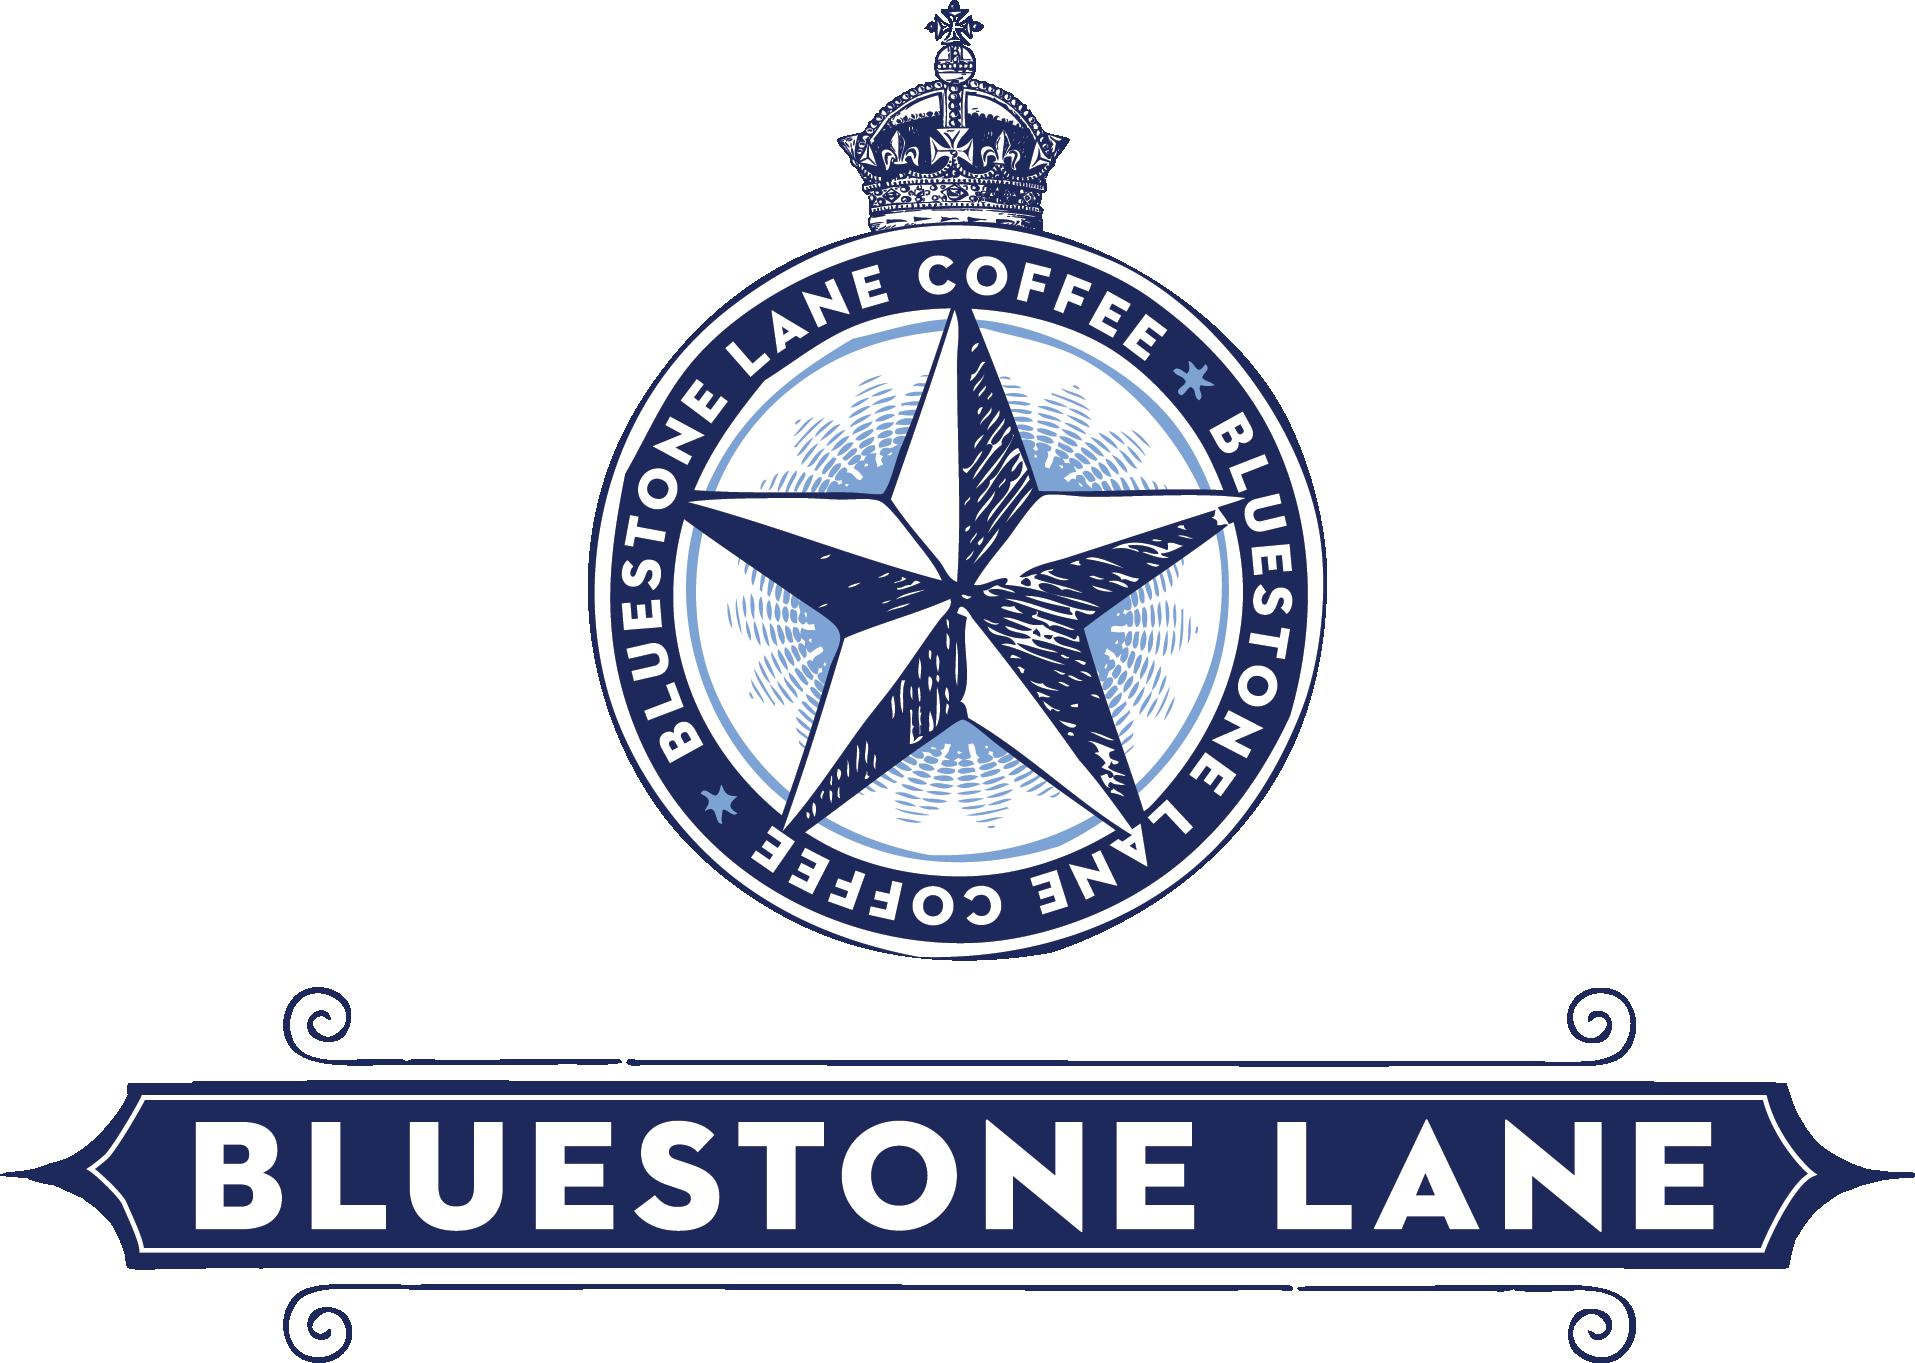 Bluestone Lane Coffee Shop